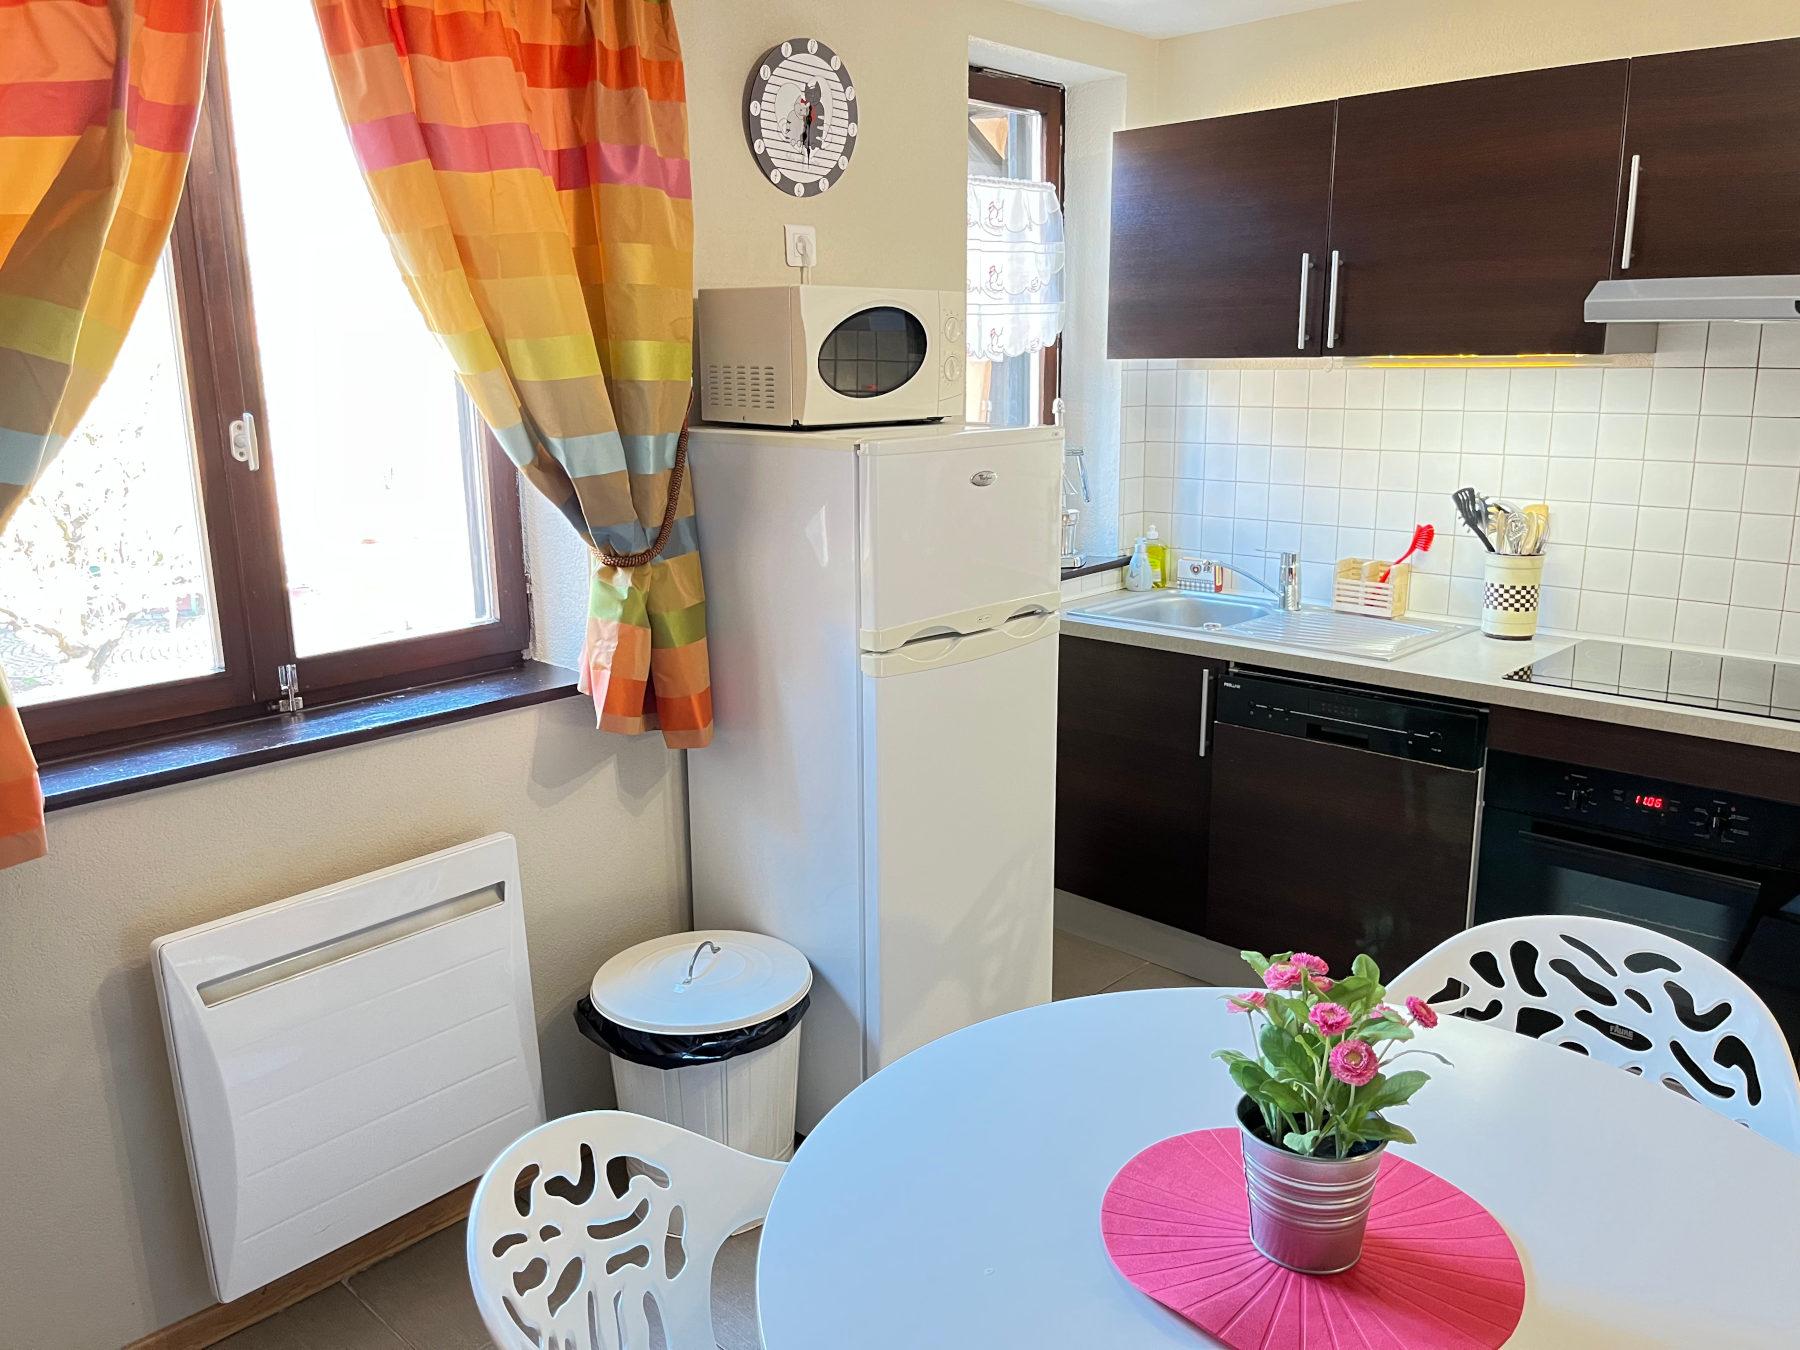 g te saint l on tania minni 37 grand 39 rue 68420 eguisheim france. Black Bedroom Furniture Sets. Home Design Ideas